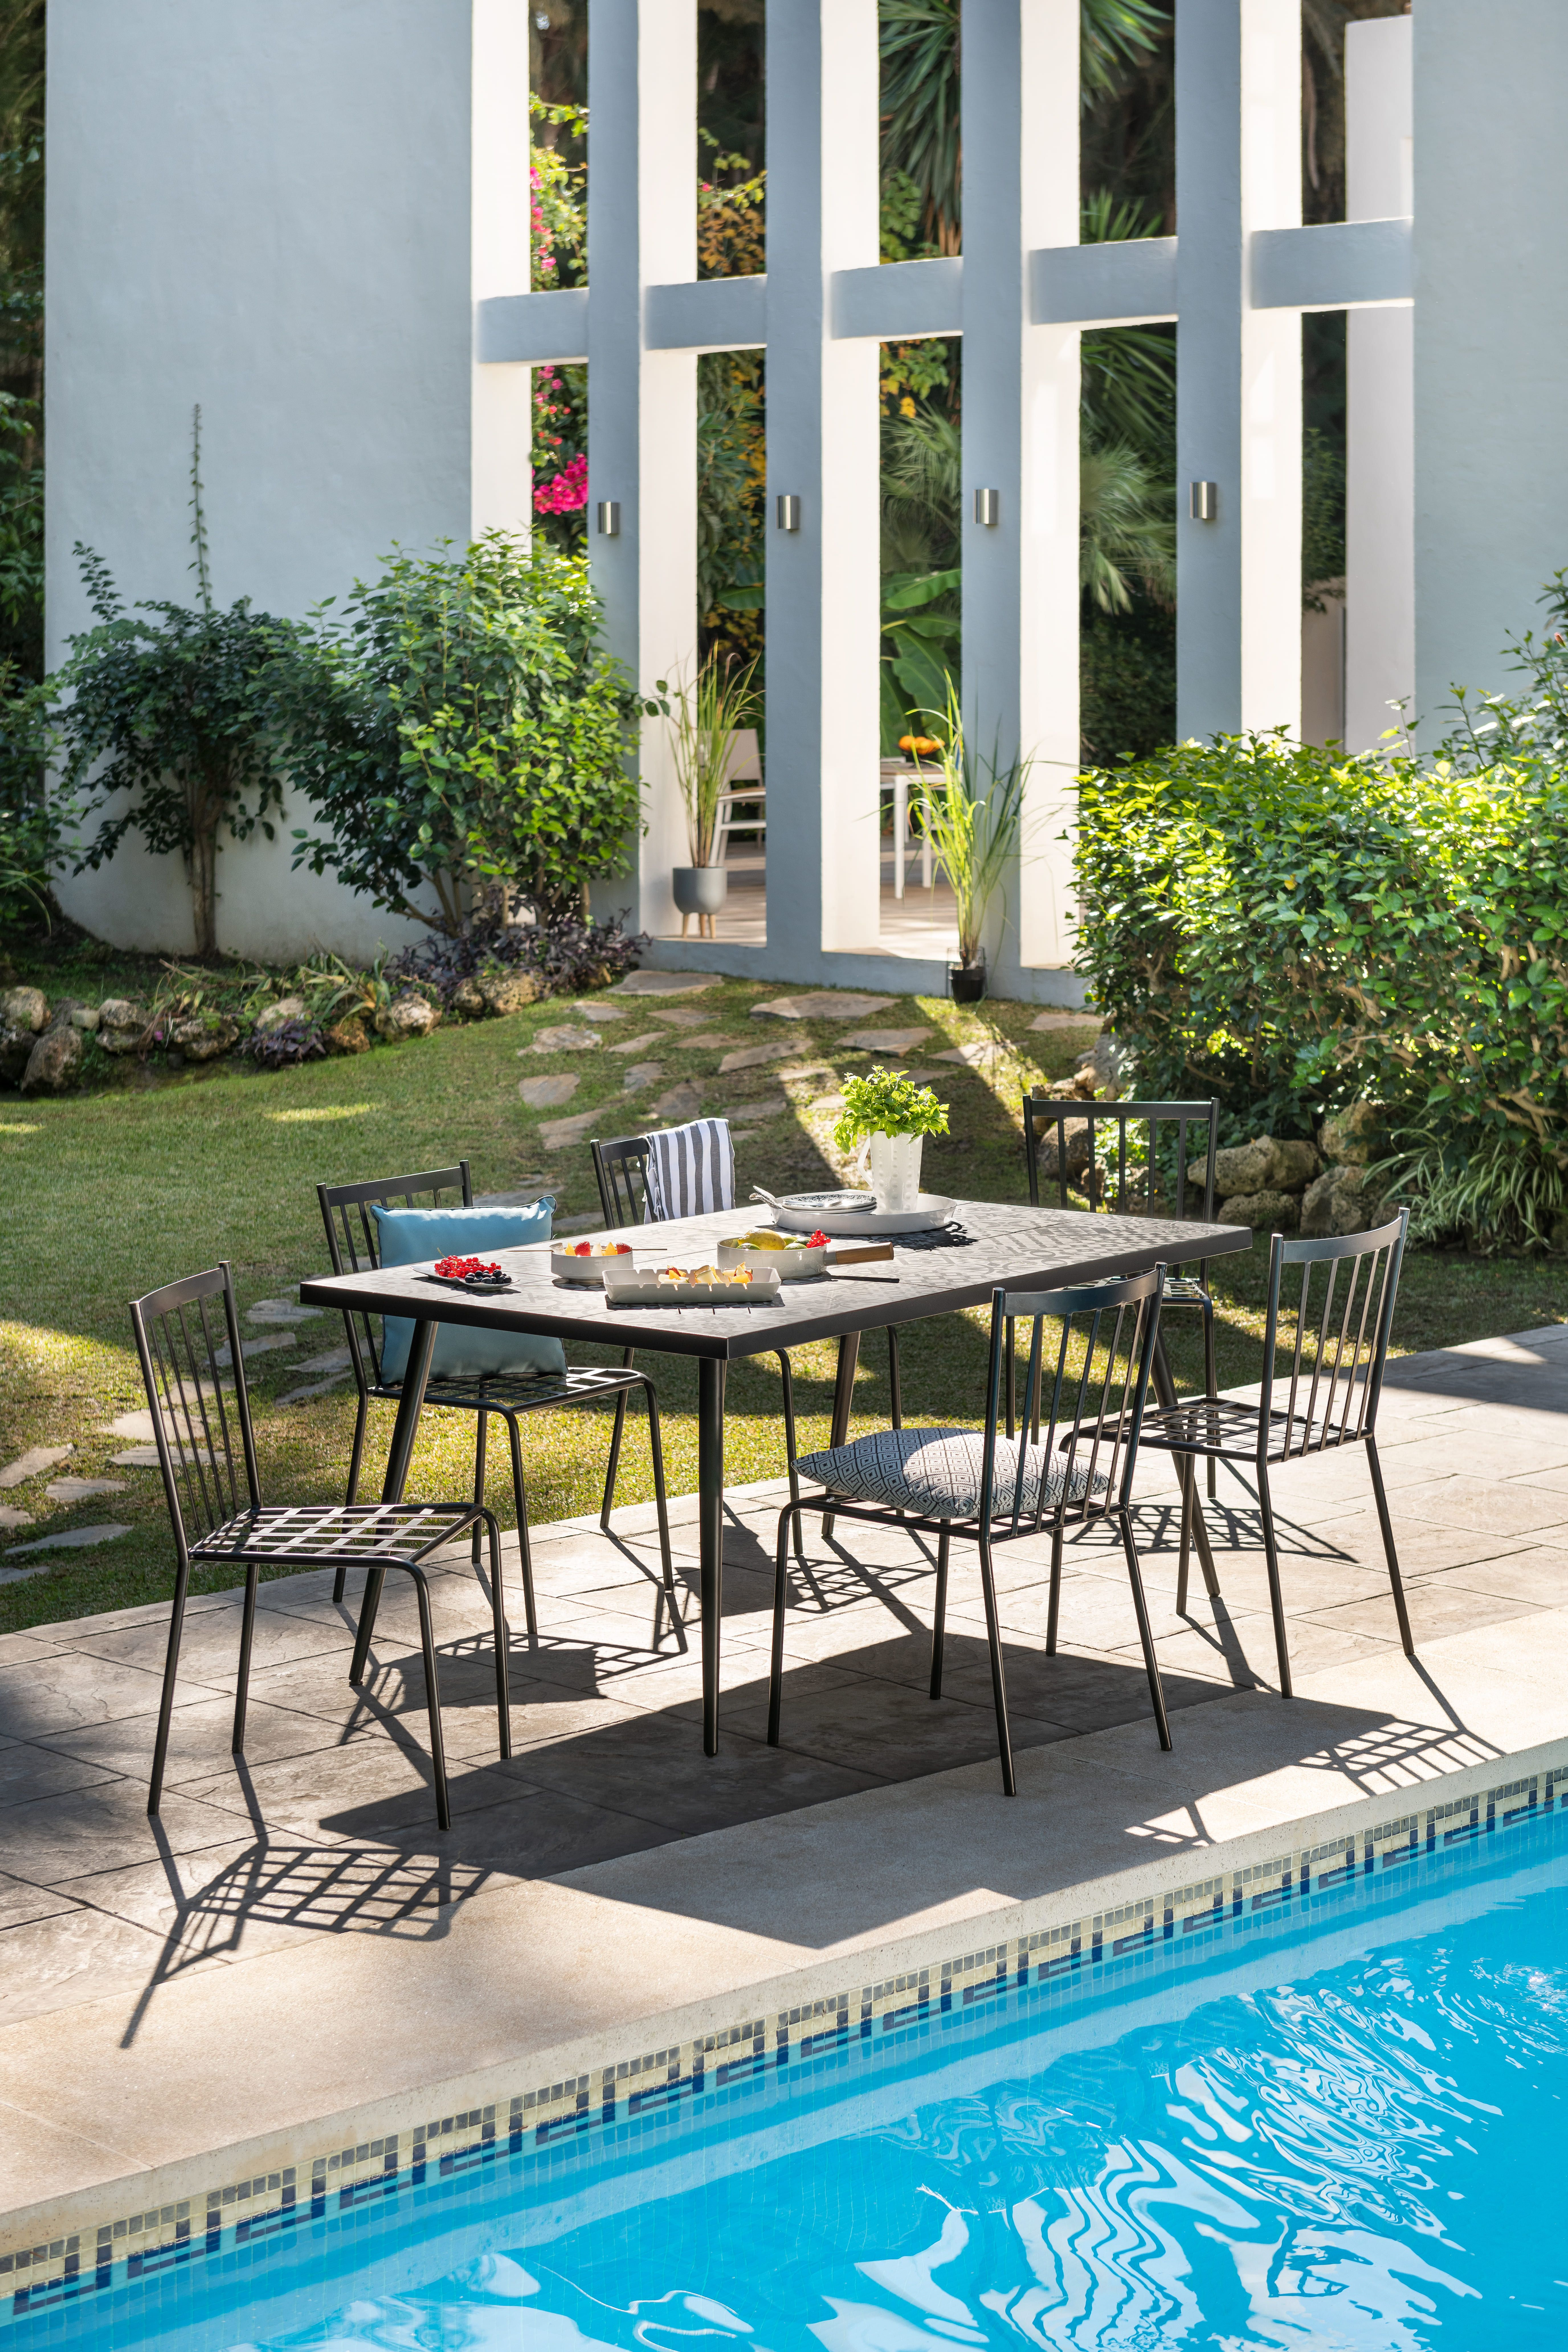 Table de jardin | URBAN - COLLECTION OUTDOOR en 2019 | Table ...